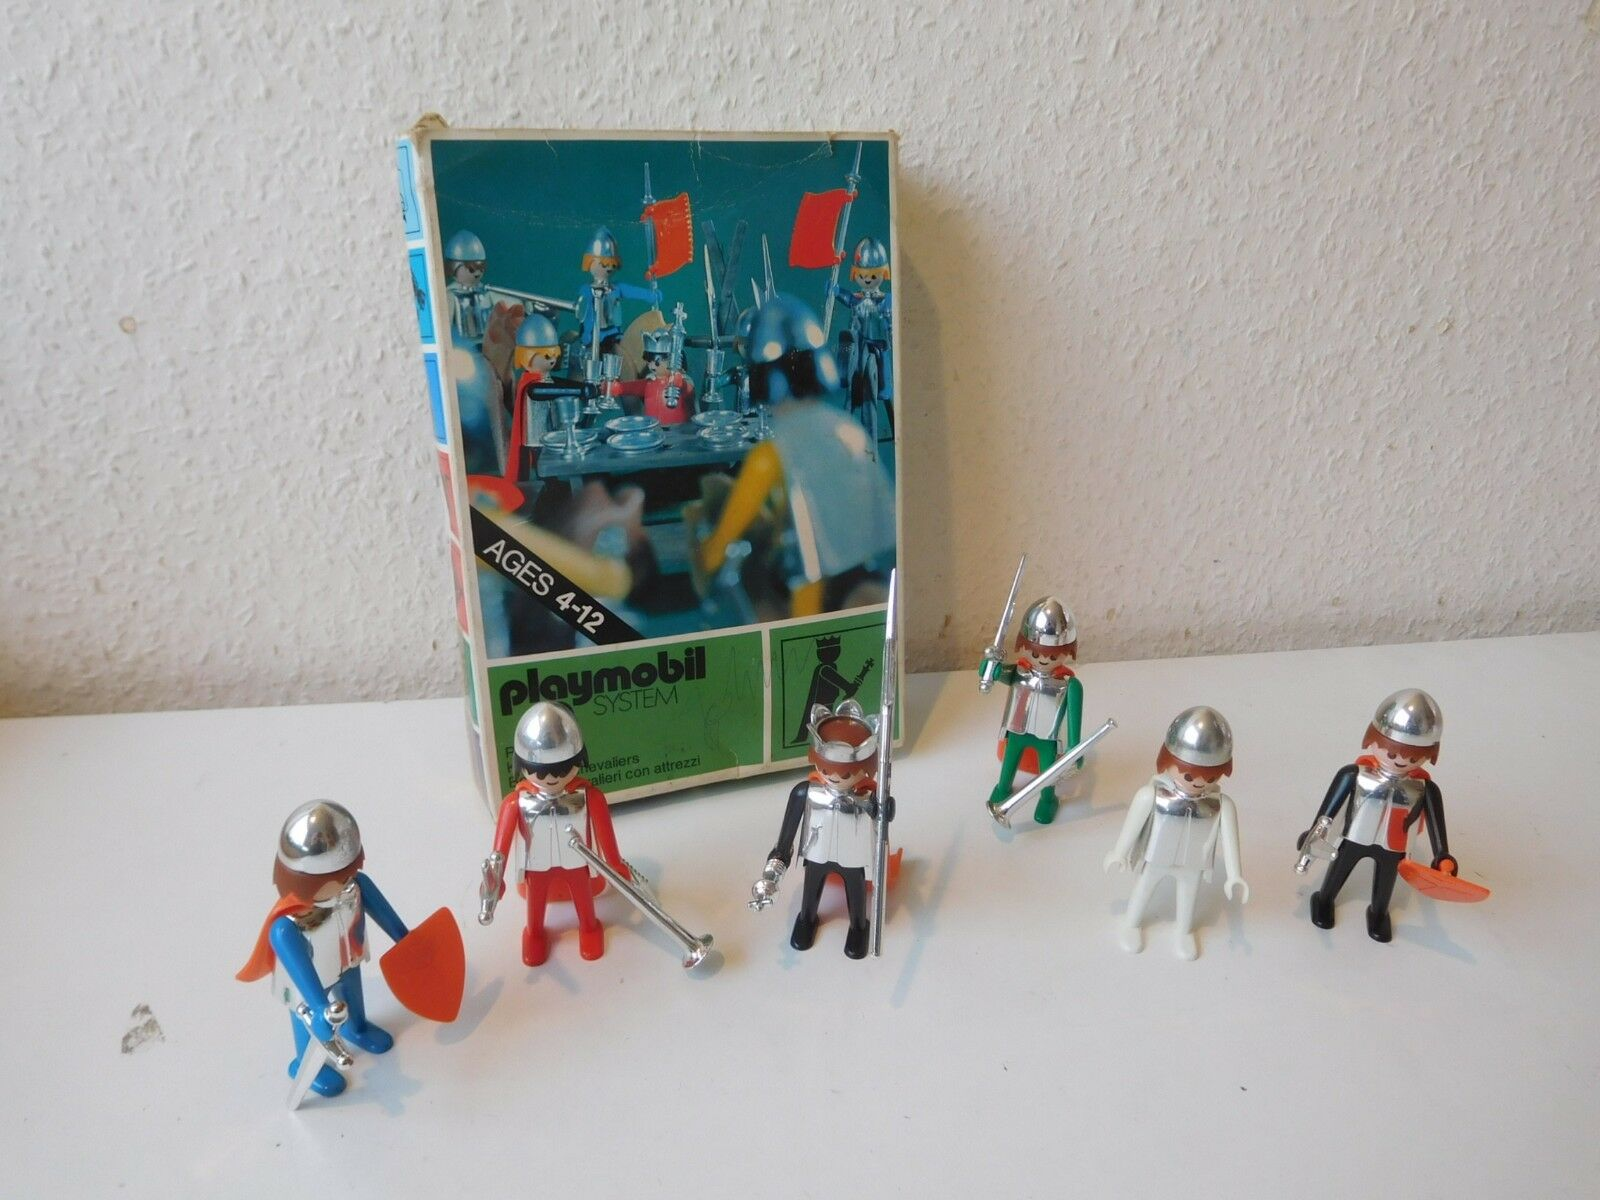 Playmobil set 3261 V1 knights  ovp 1974